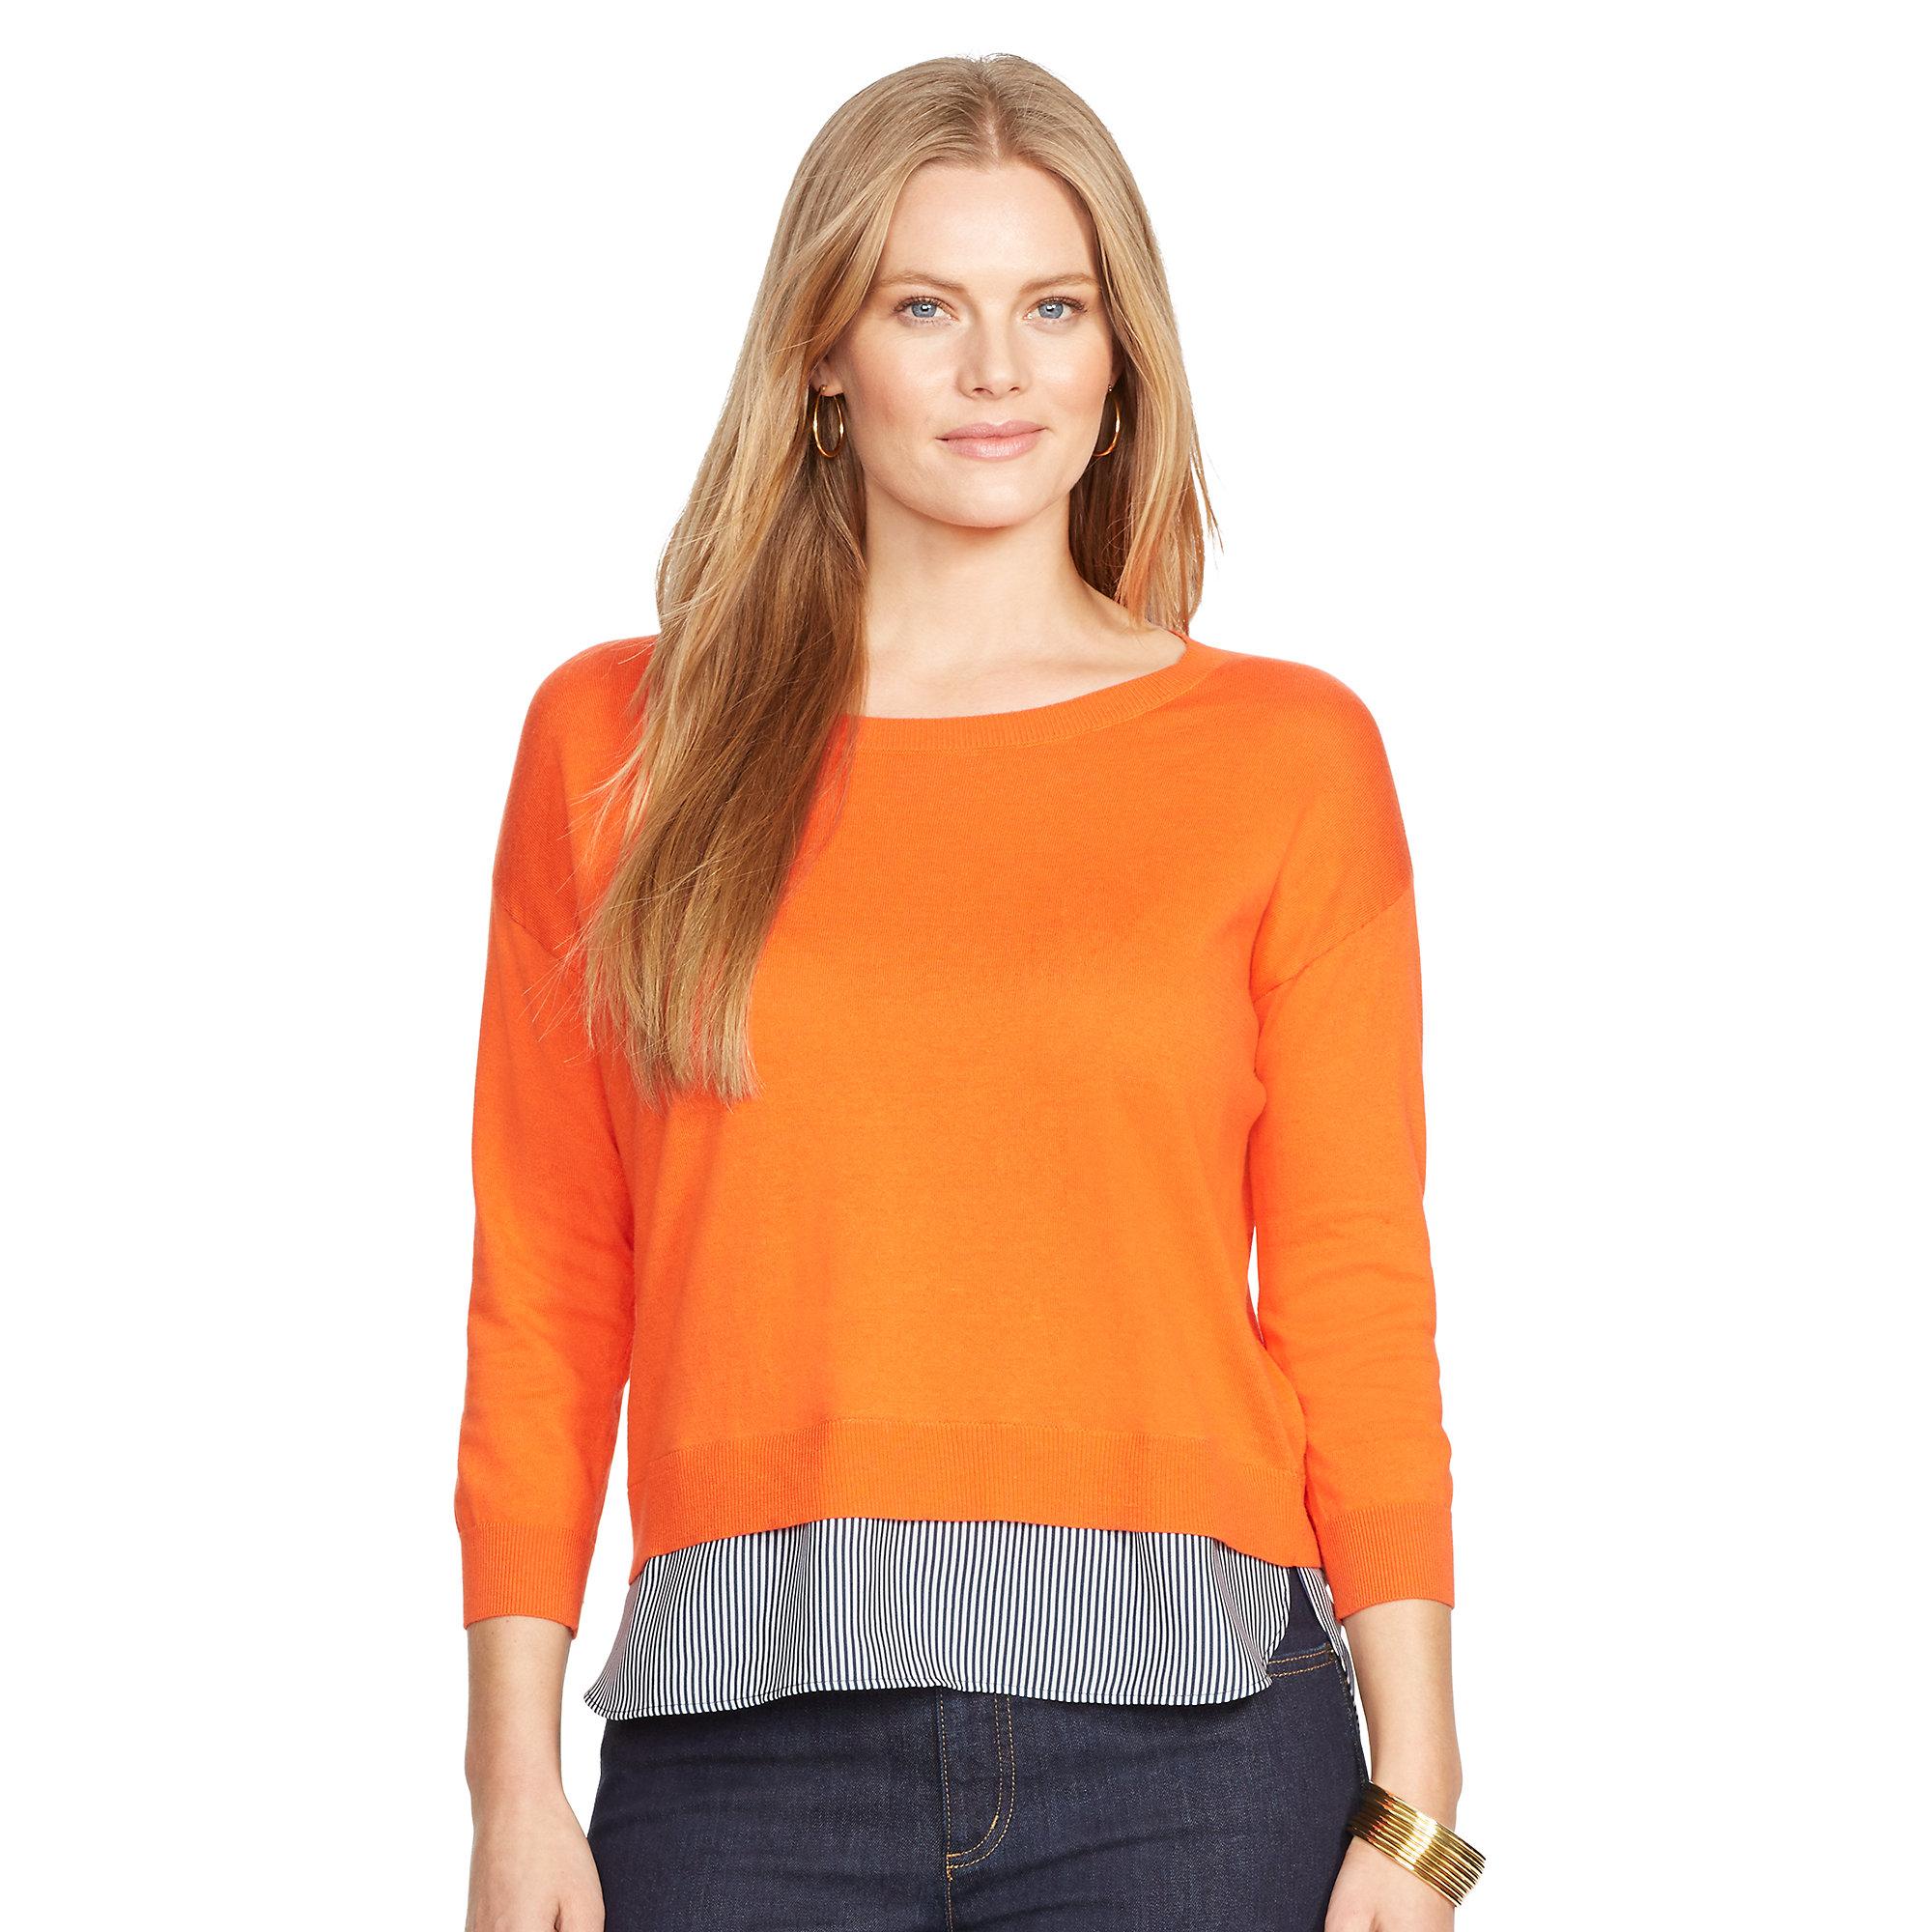 4b8046d64 ... order lyst ralph lauren layered crewneck sweater in orange 90dc9 f0a7f